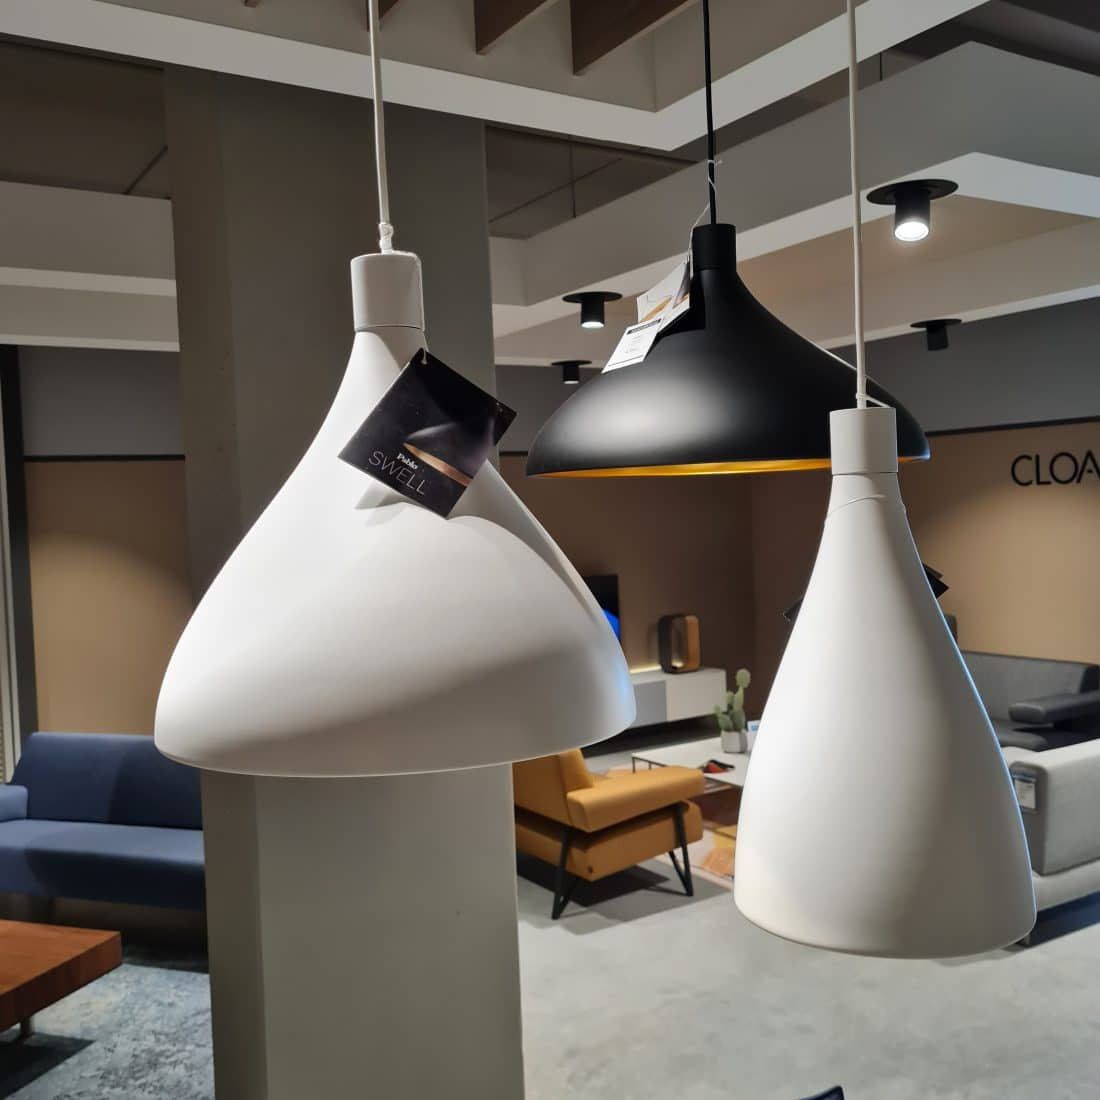 Swell Hanglampen